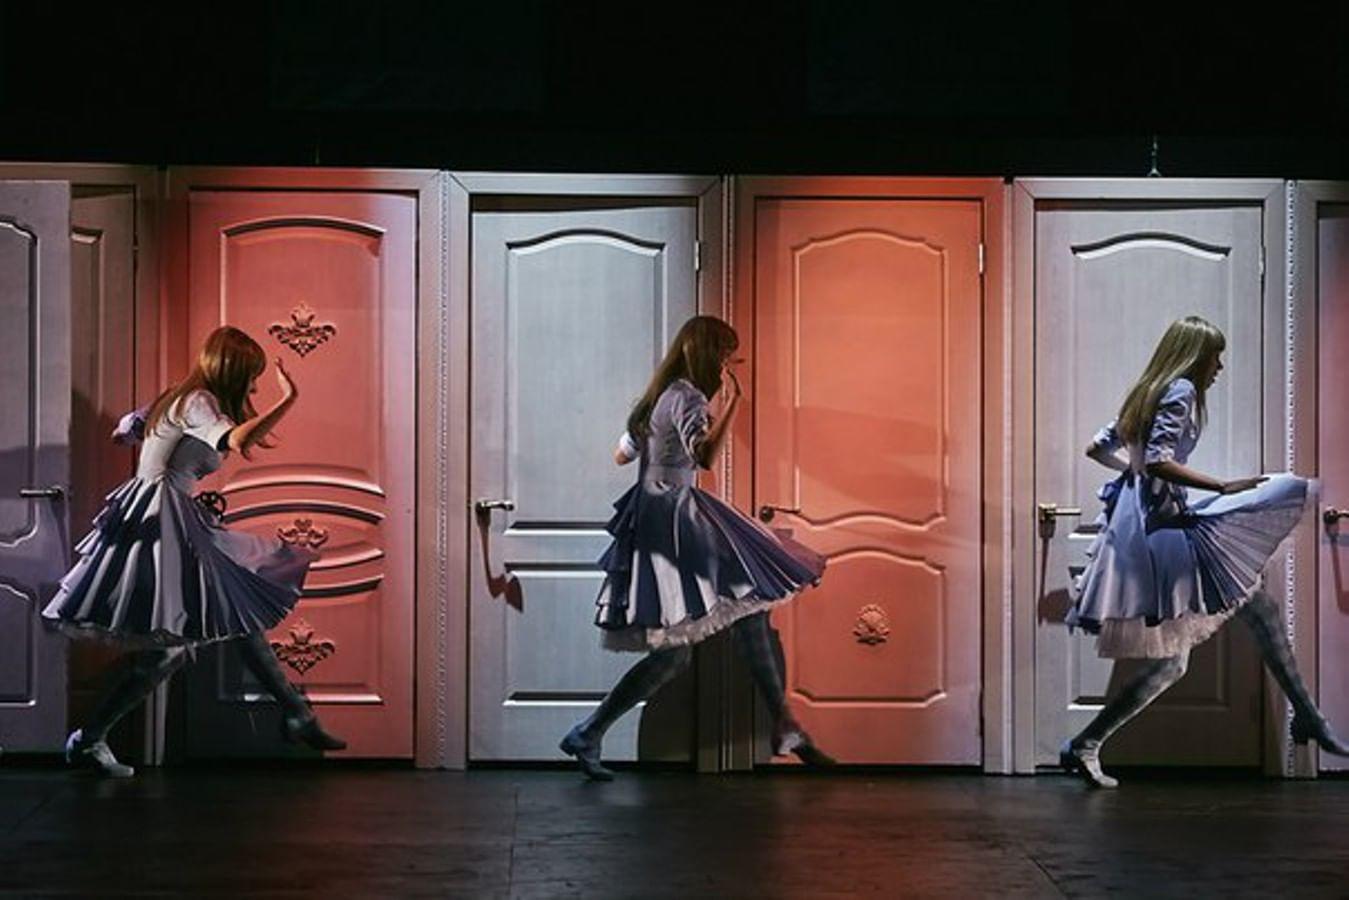 Театр юного зрителя. Спектакль «Алиsа».